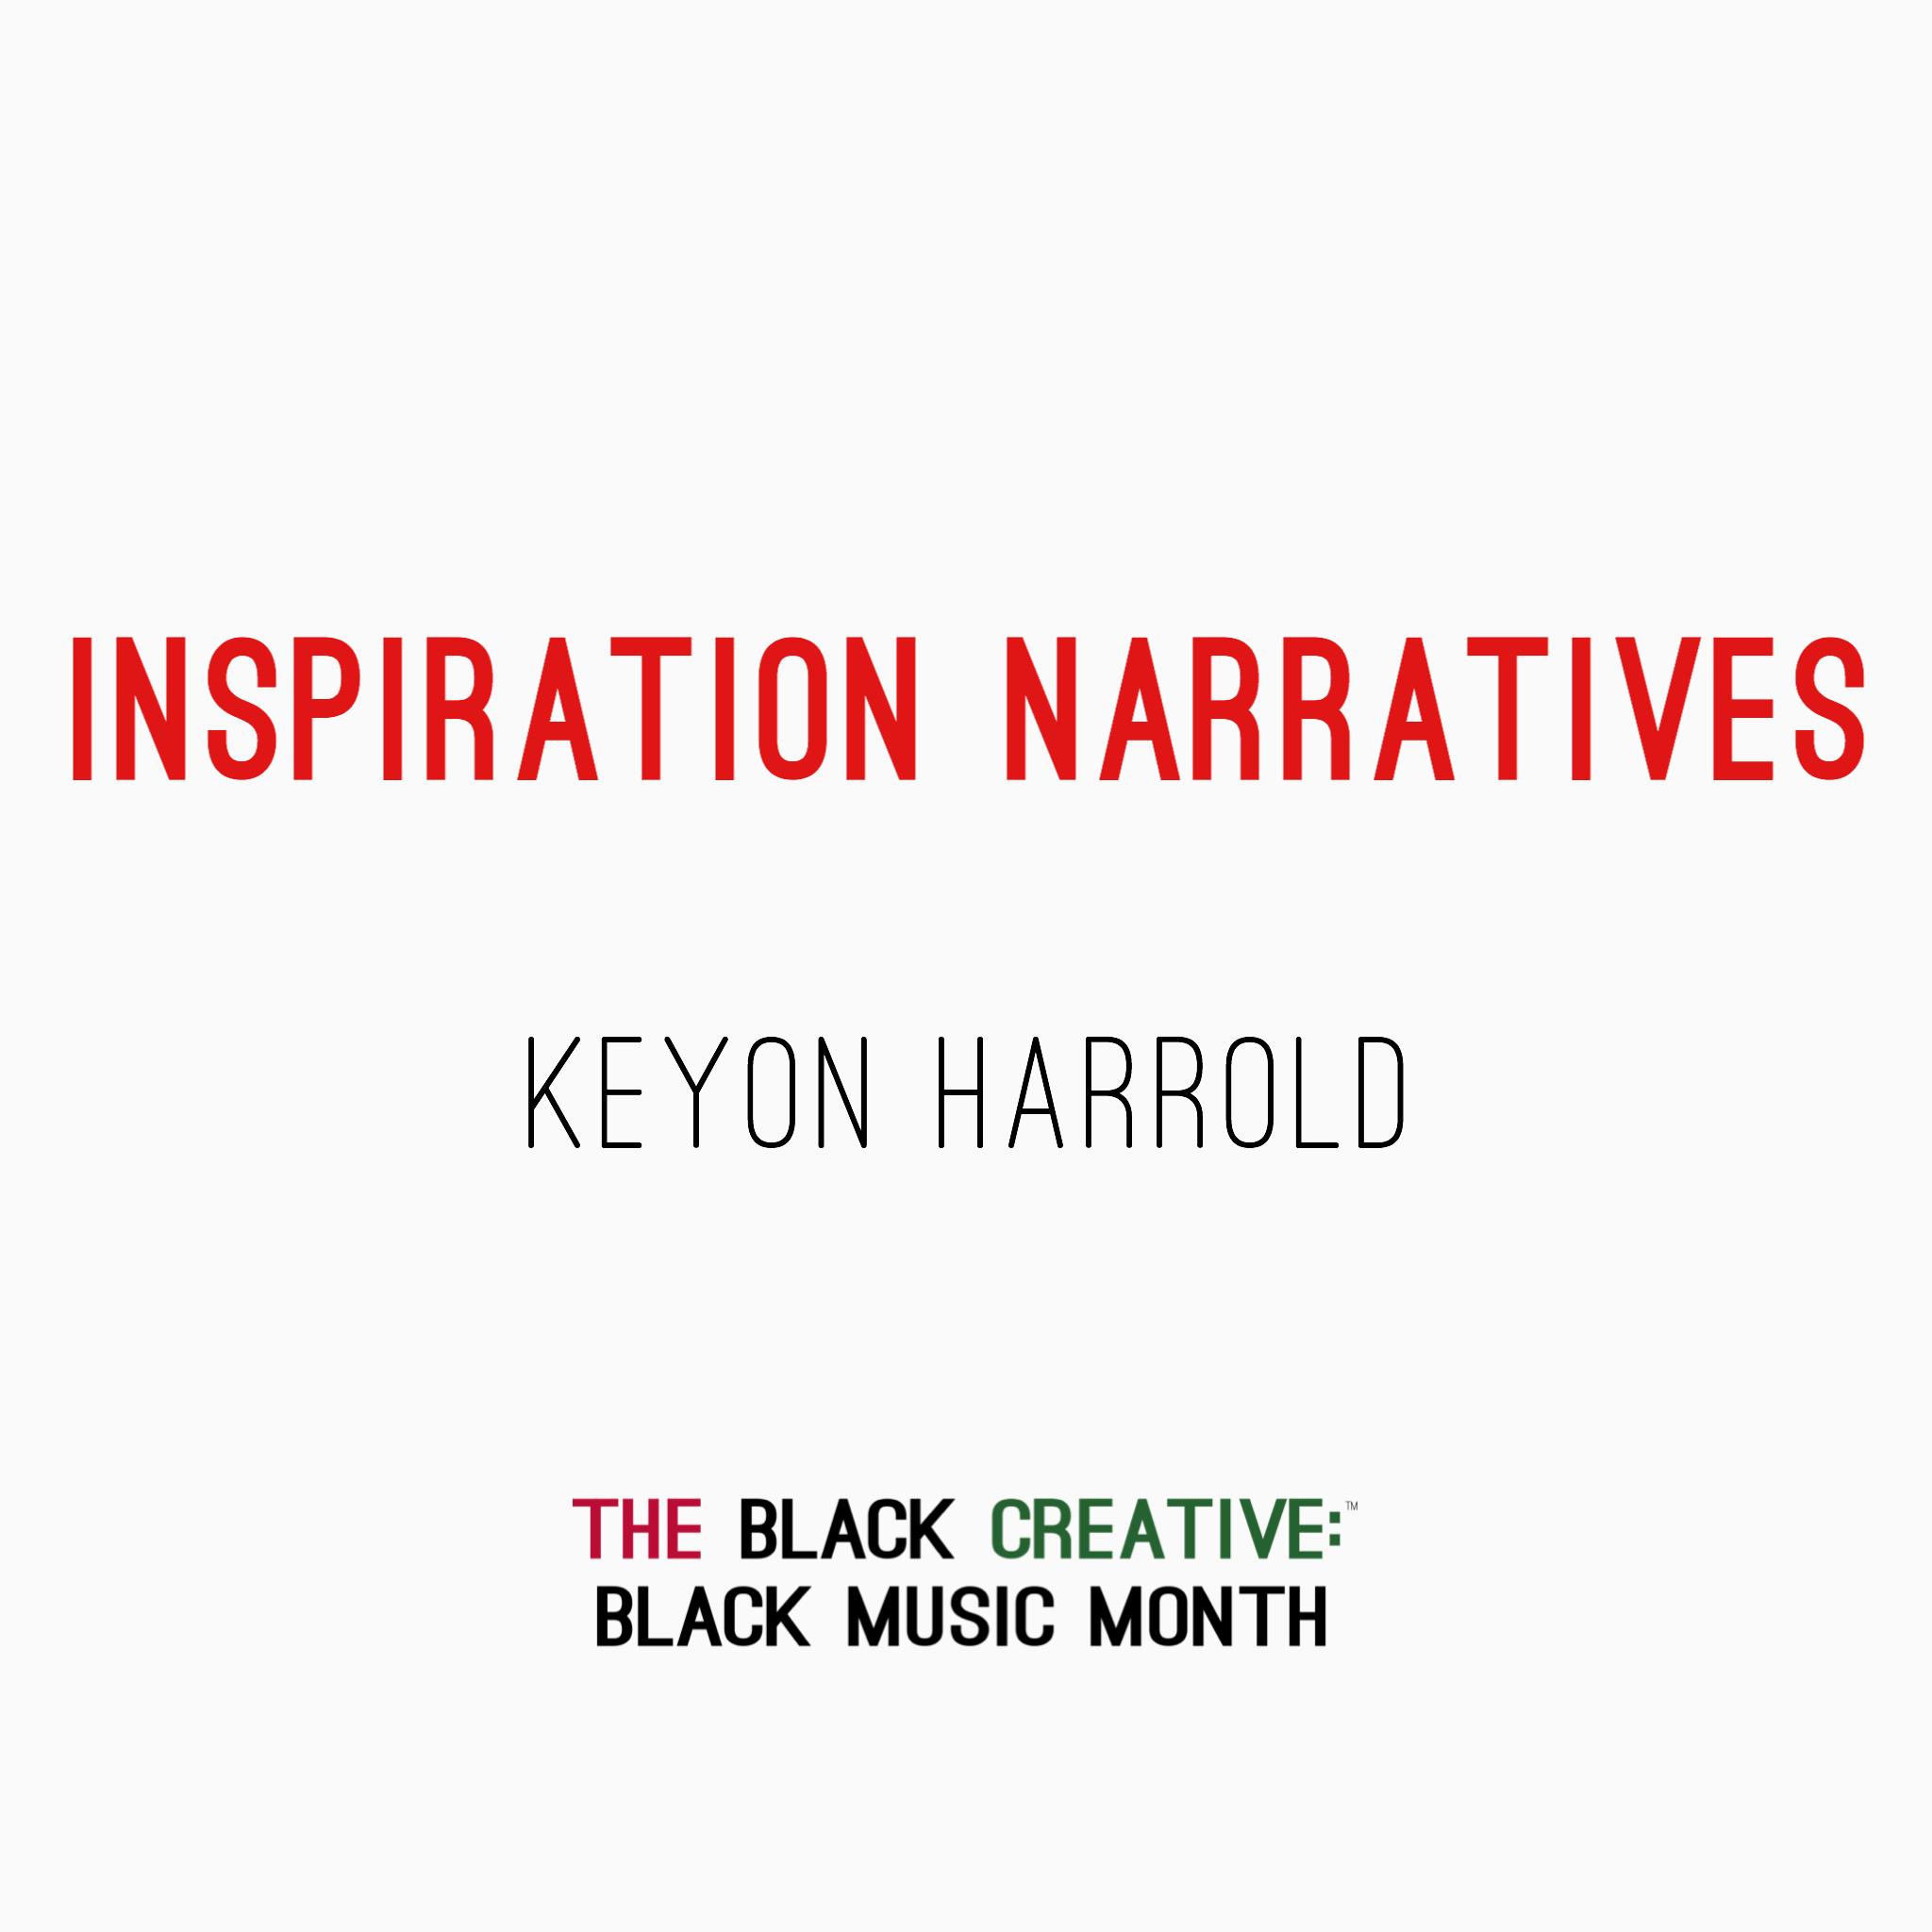 Inspiration Narratives - Keyon Harrold